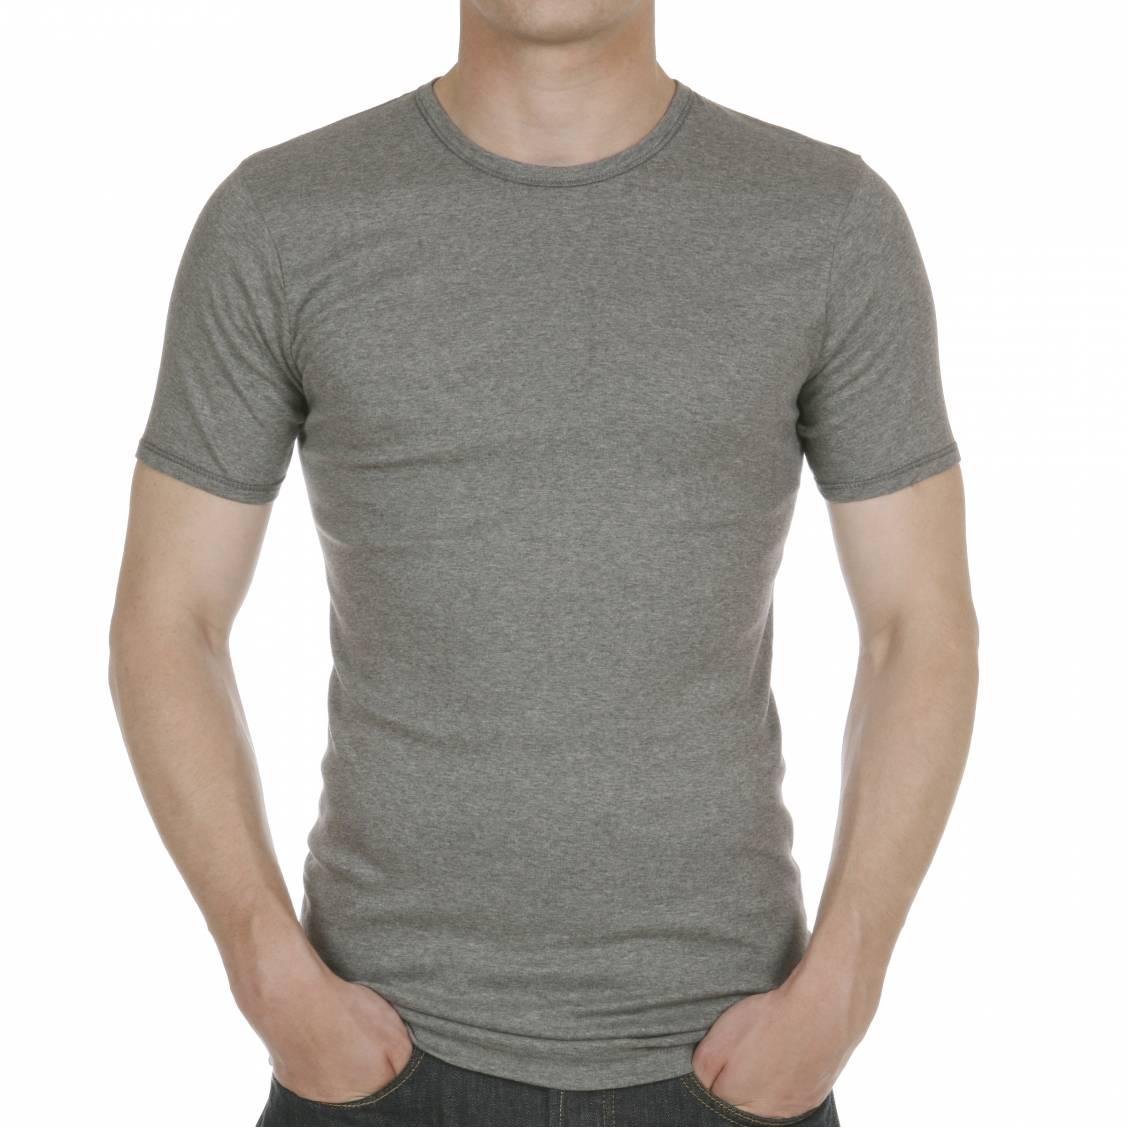 tee shirt gris col rond en pur coton hypoallerg nique rue des hommes. Black Bedroom Furniture Sets. Home Design Ideas